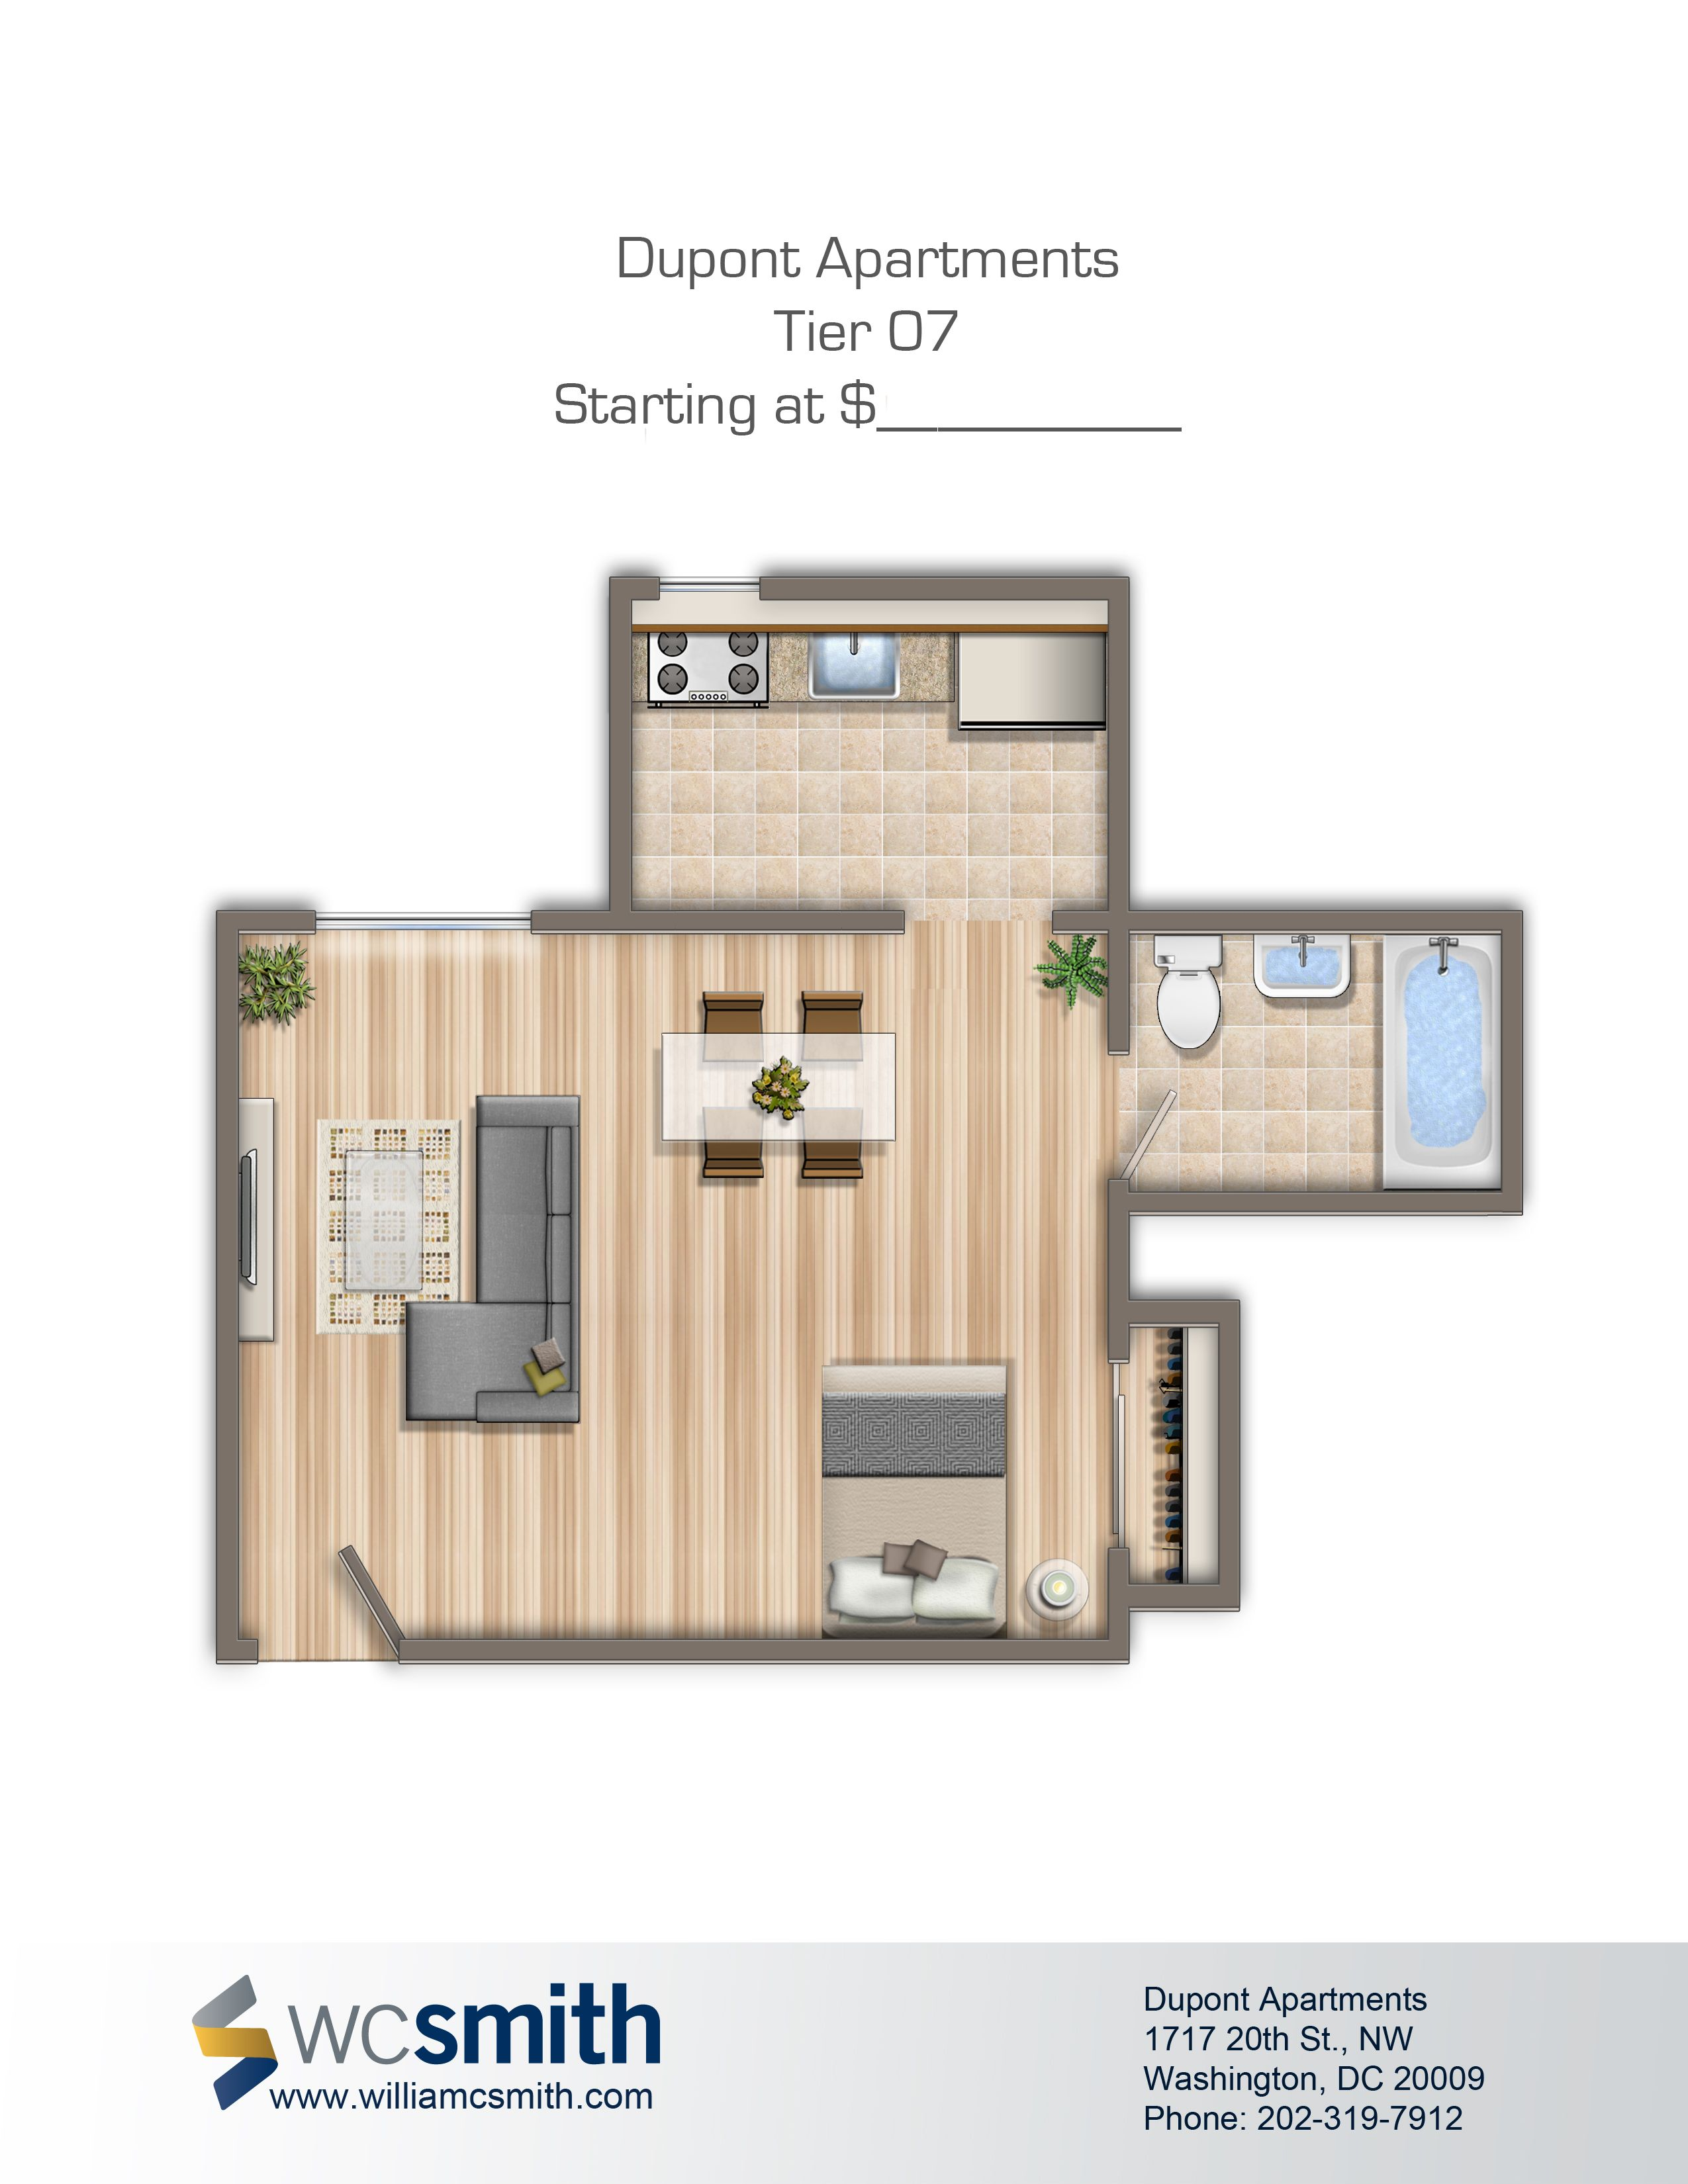 Dupont apartments washington dc floor plans and for Studio apartment plans 16x32